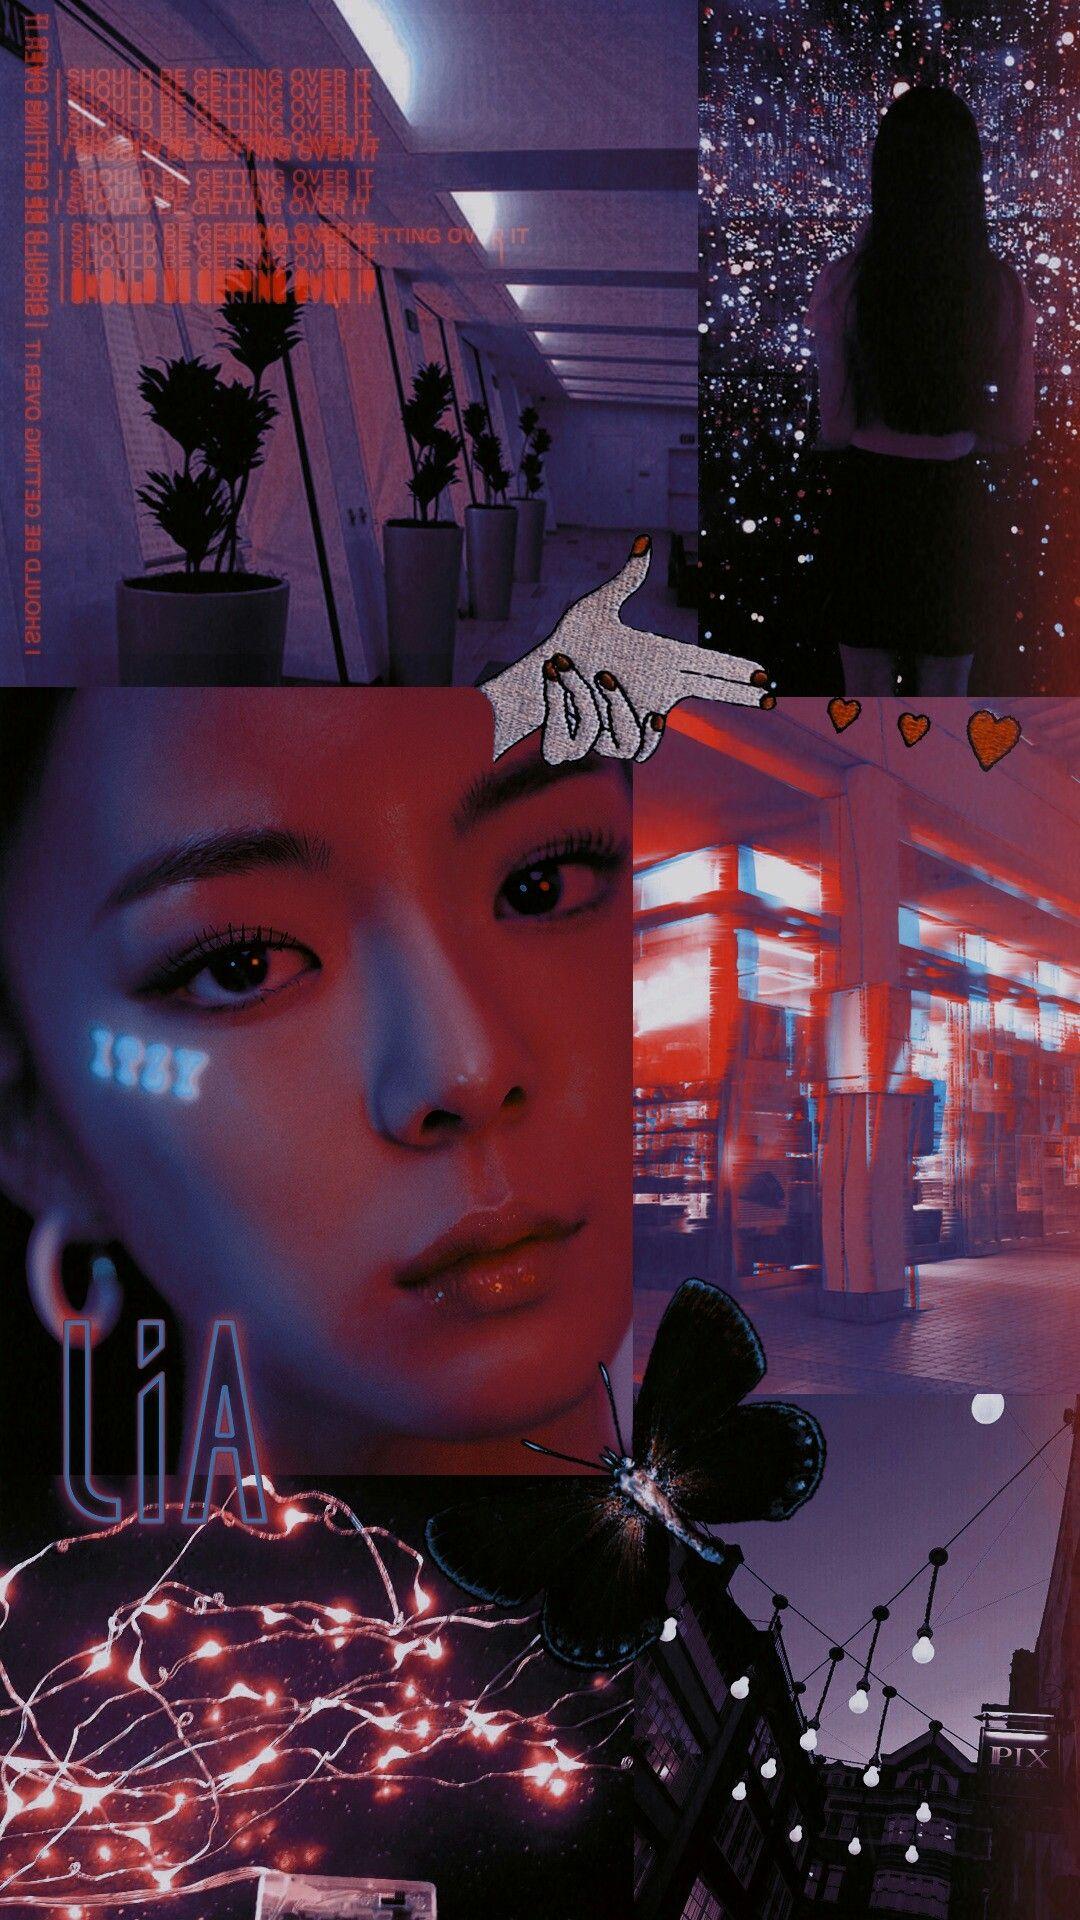 lia aesthetic wallpaper itzy Animes wallpapers Tela de fundo 1080x1920